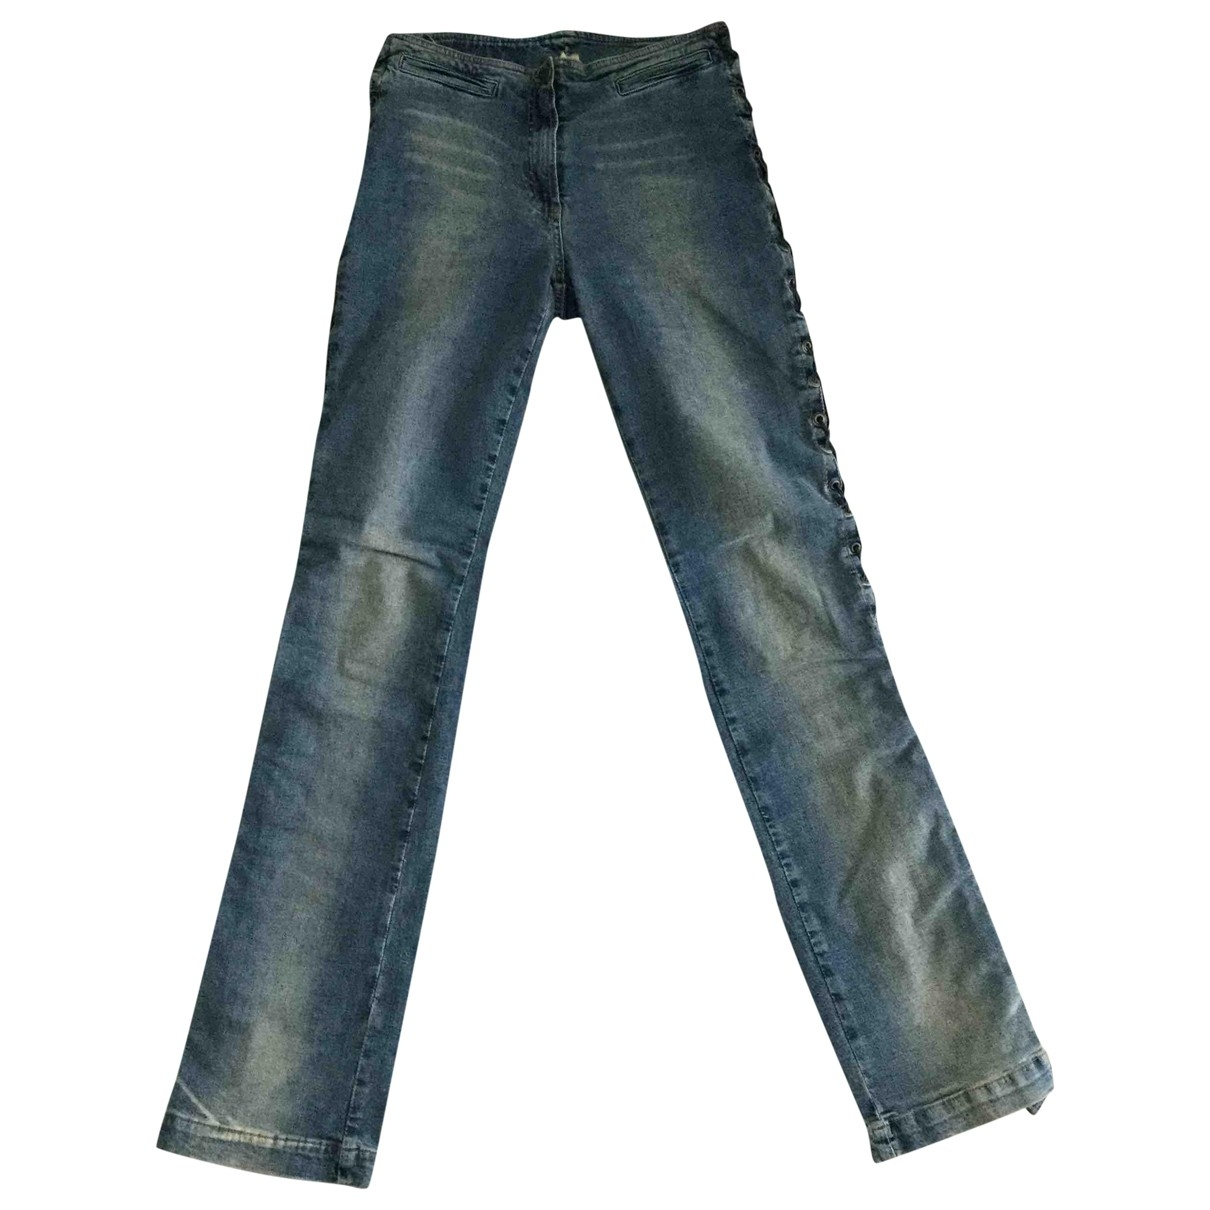 Plein Sud \N Cotton - elasthane Jeans for Women 34 FR